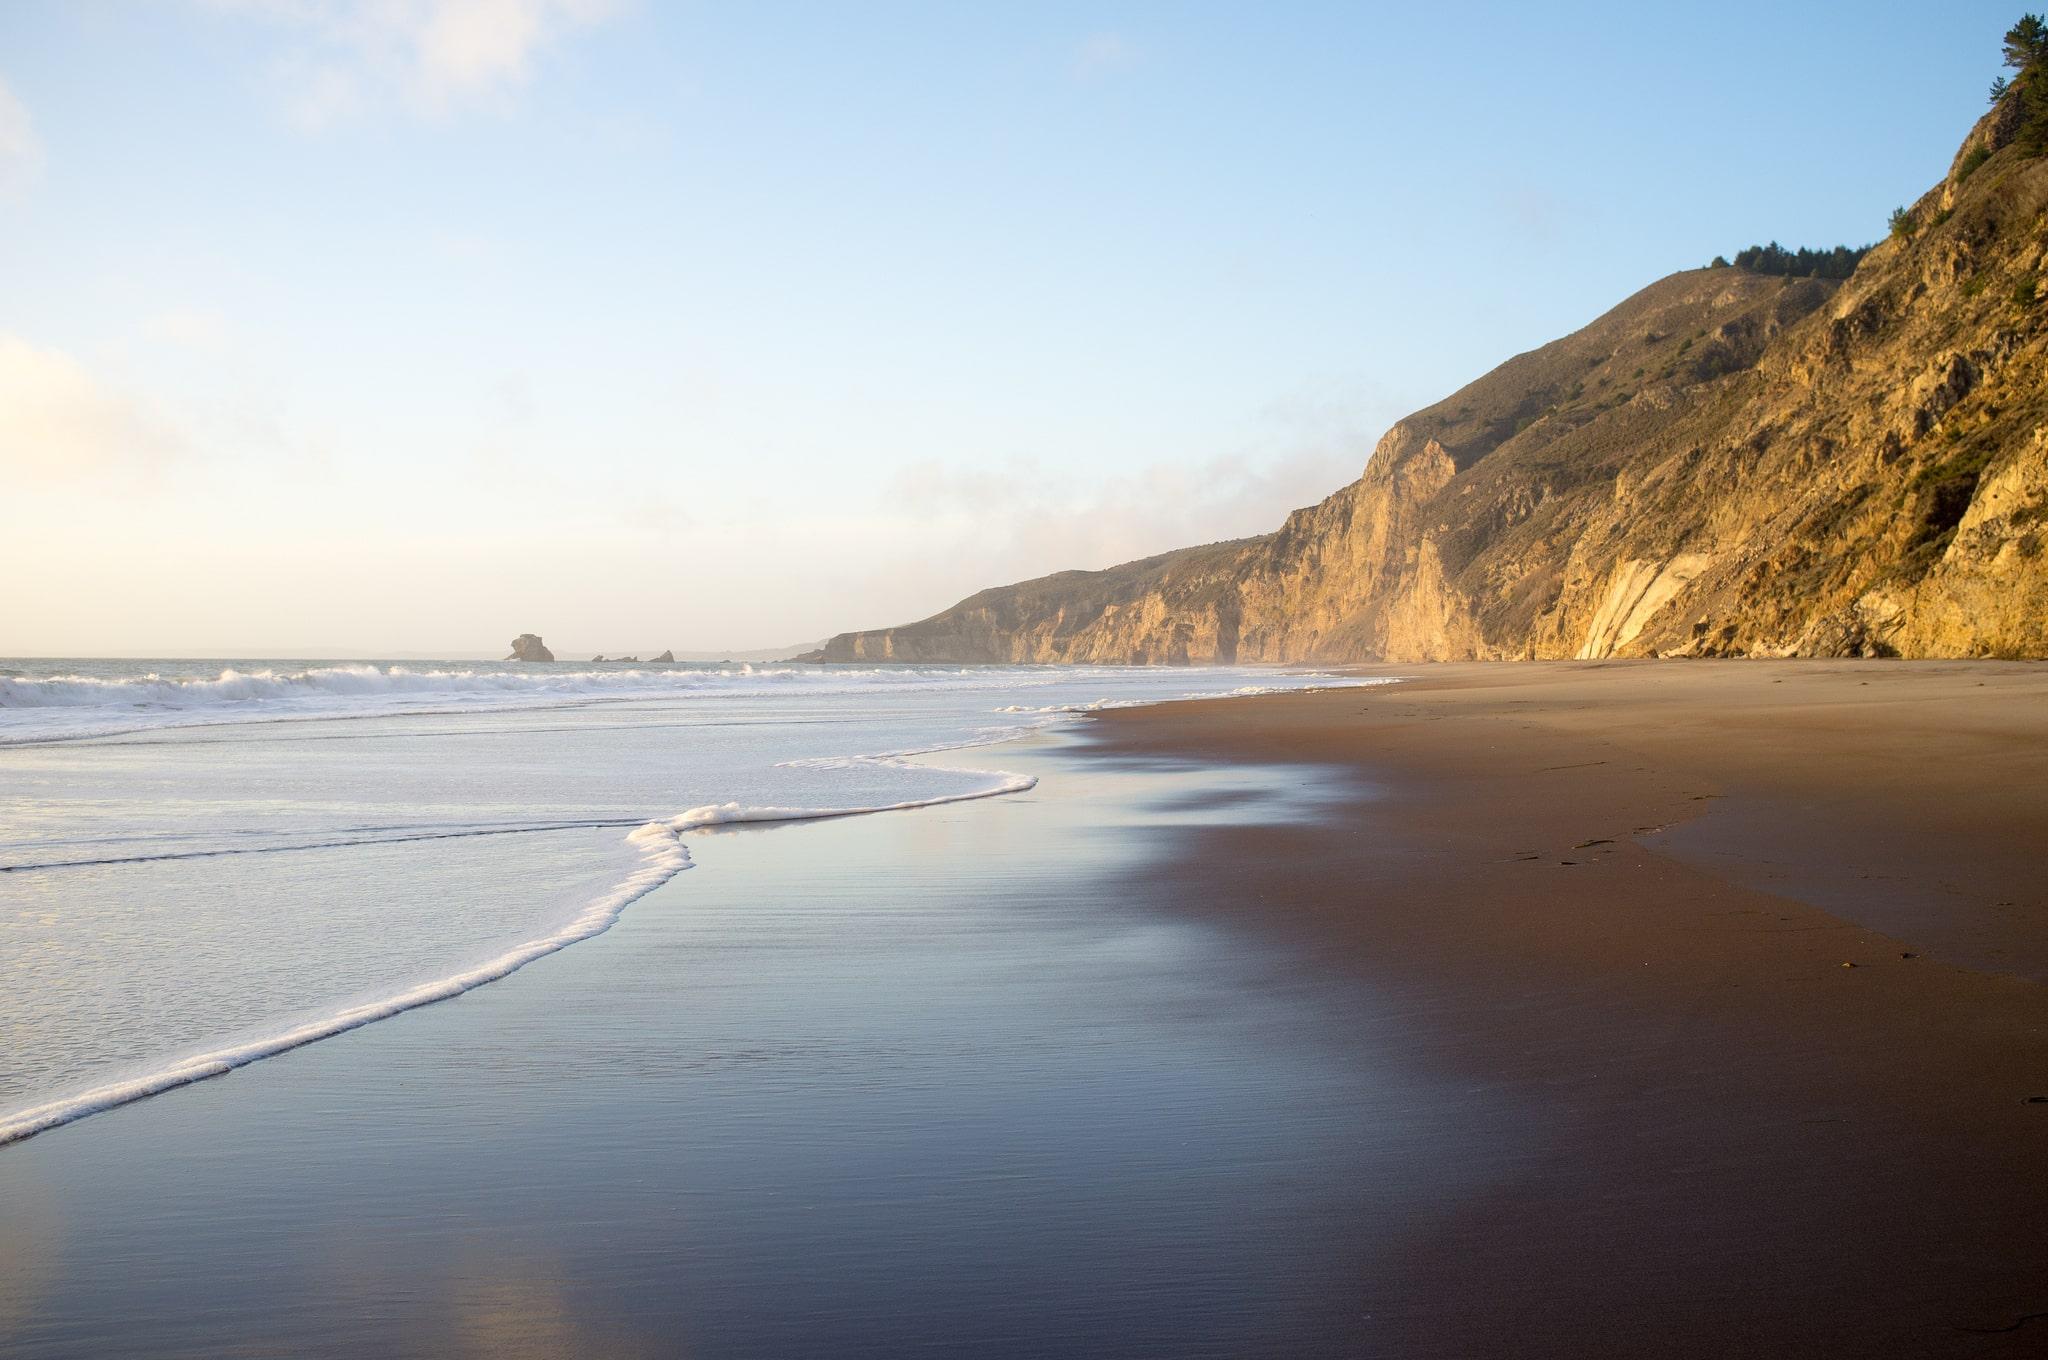 Best walk up campsites in California: Wildcat Beach at Point Reyes National Seashore